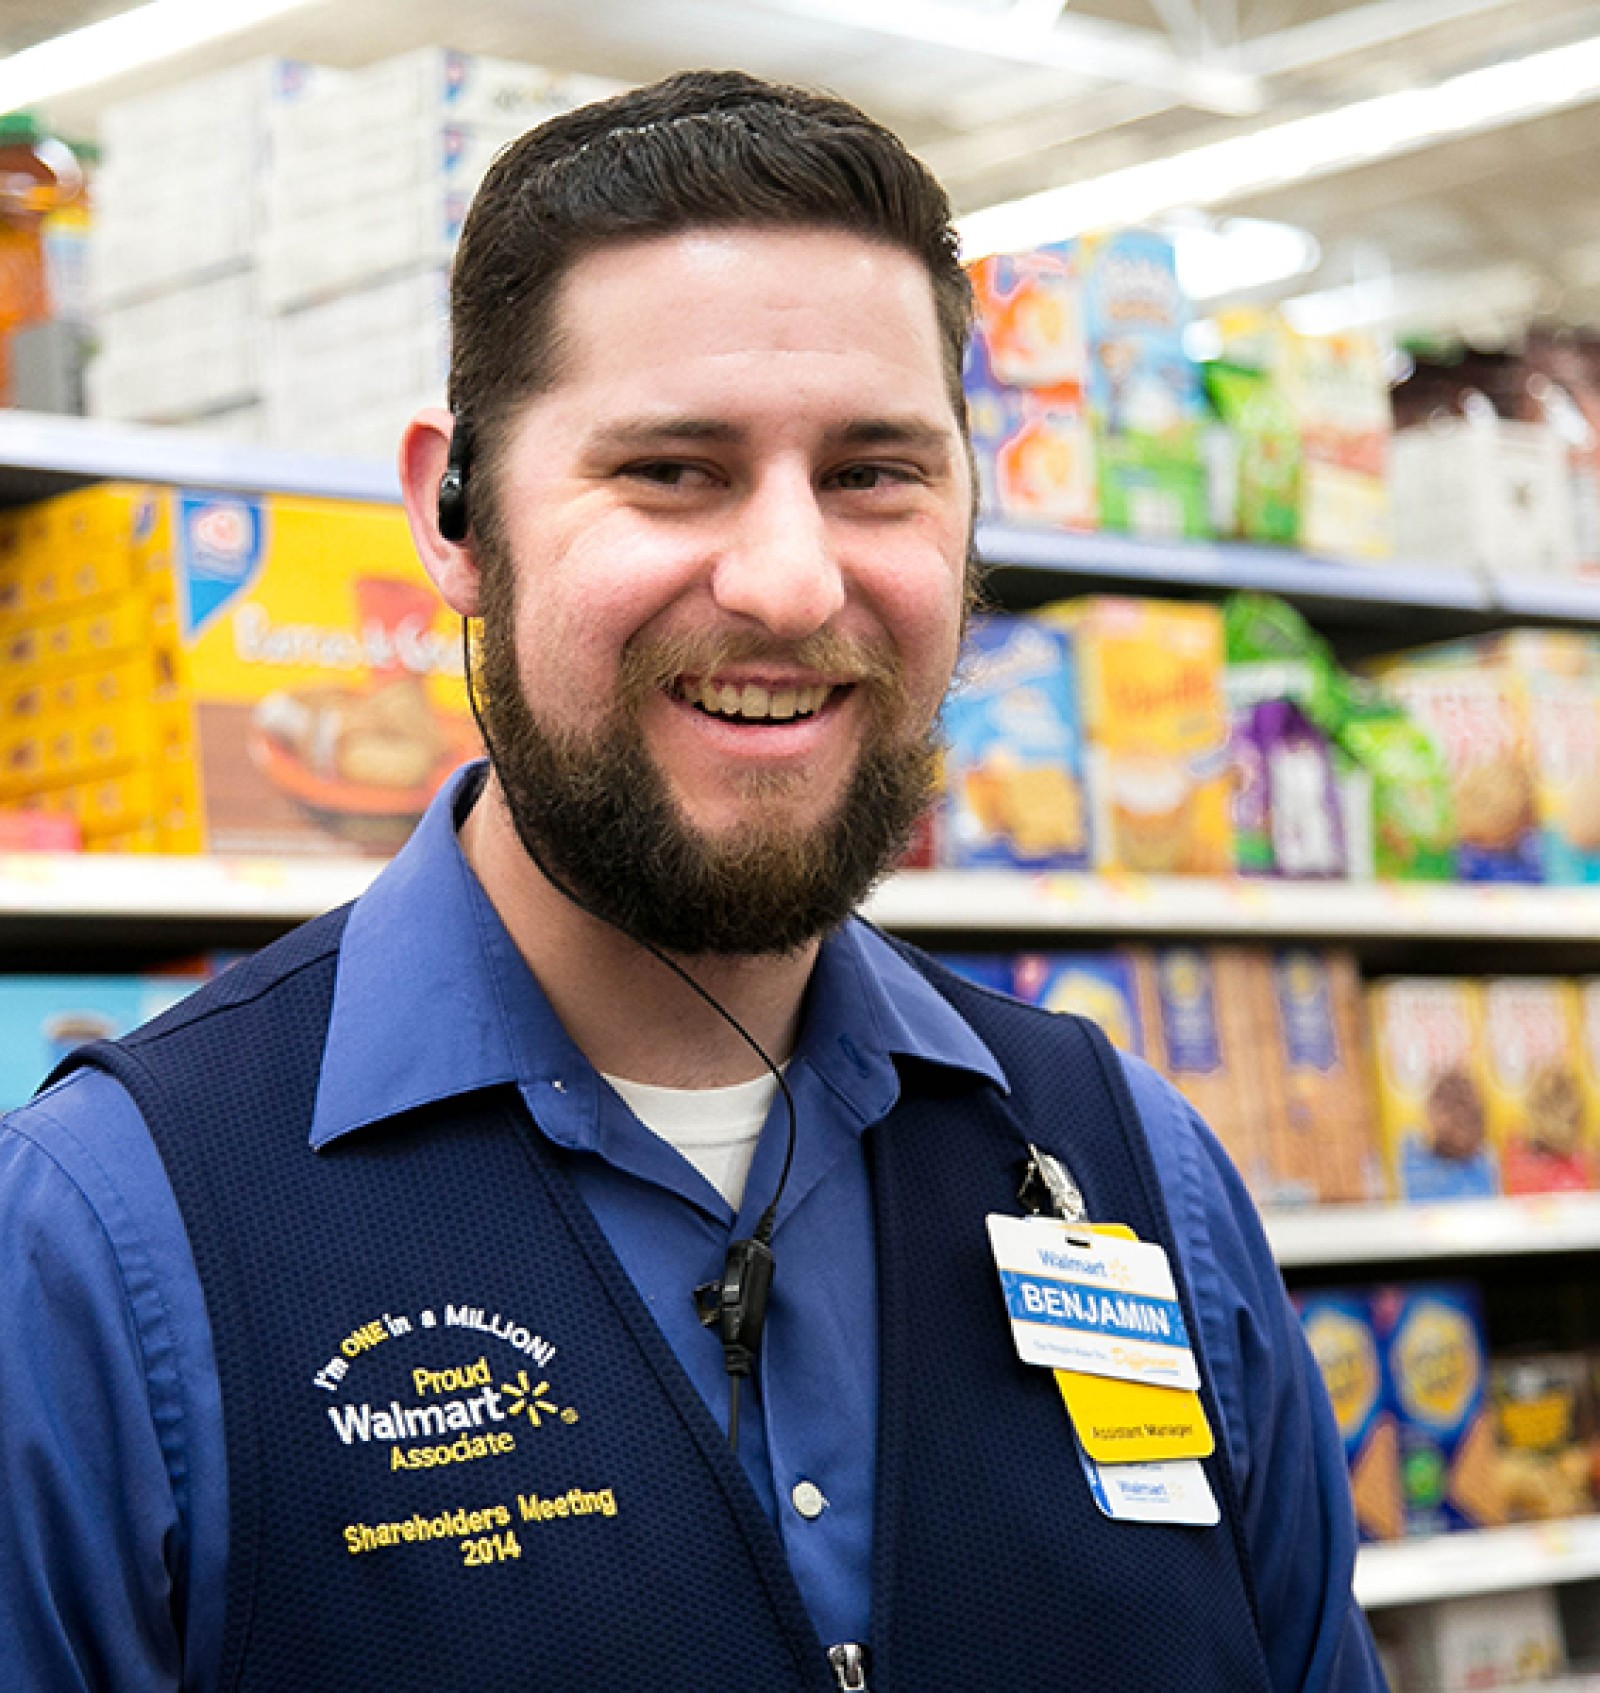 Retail Jobs Walmart Careers